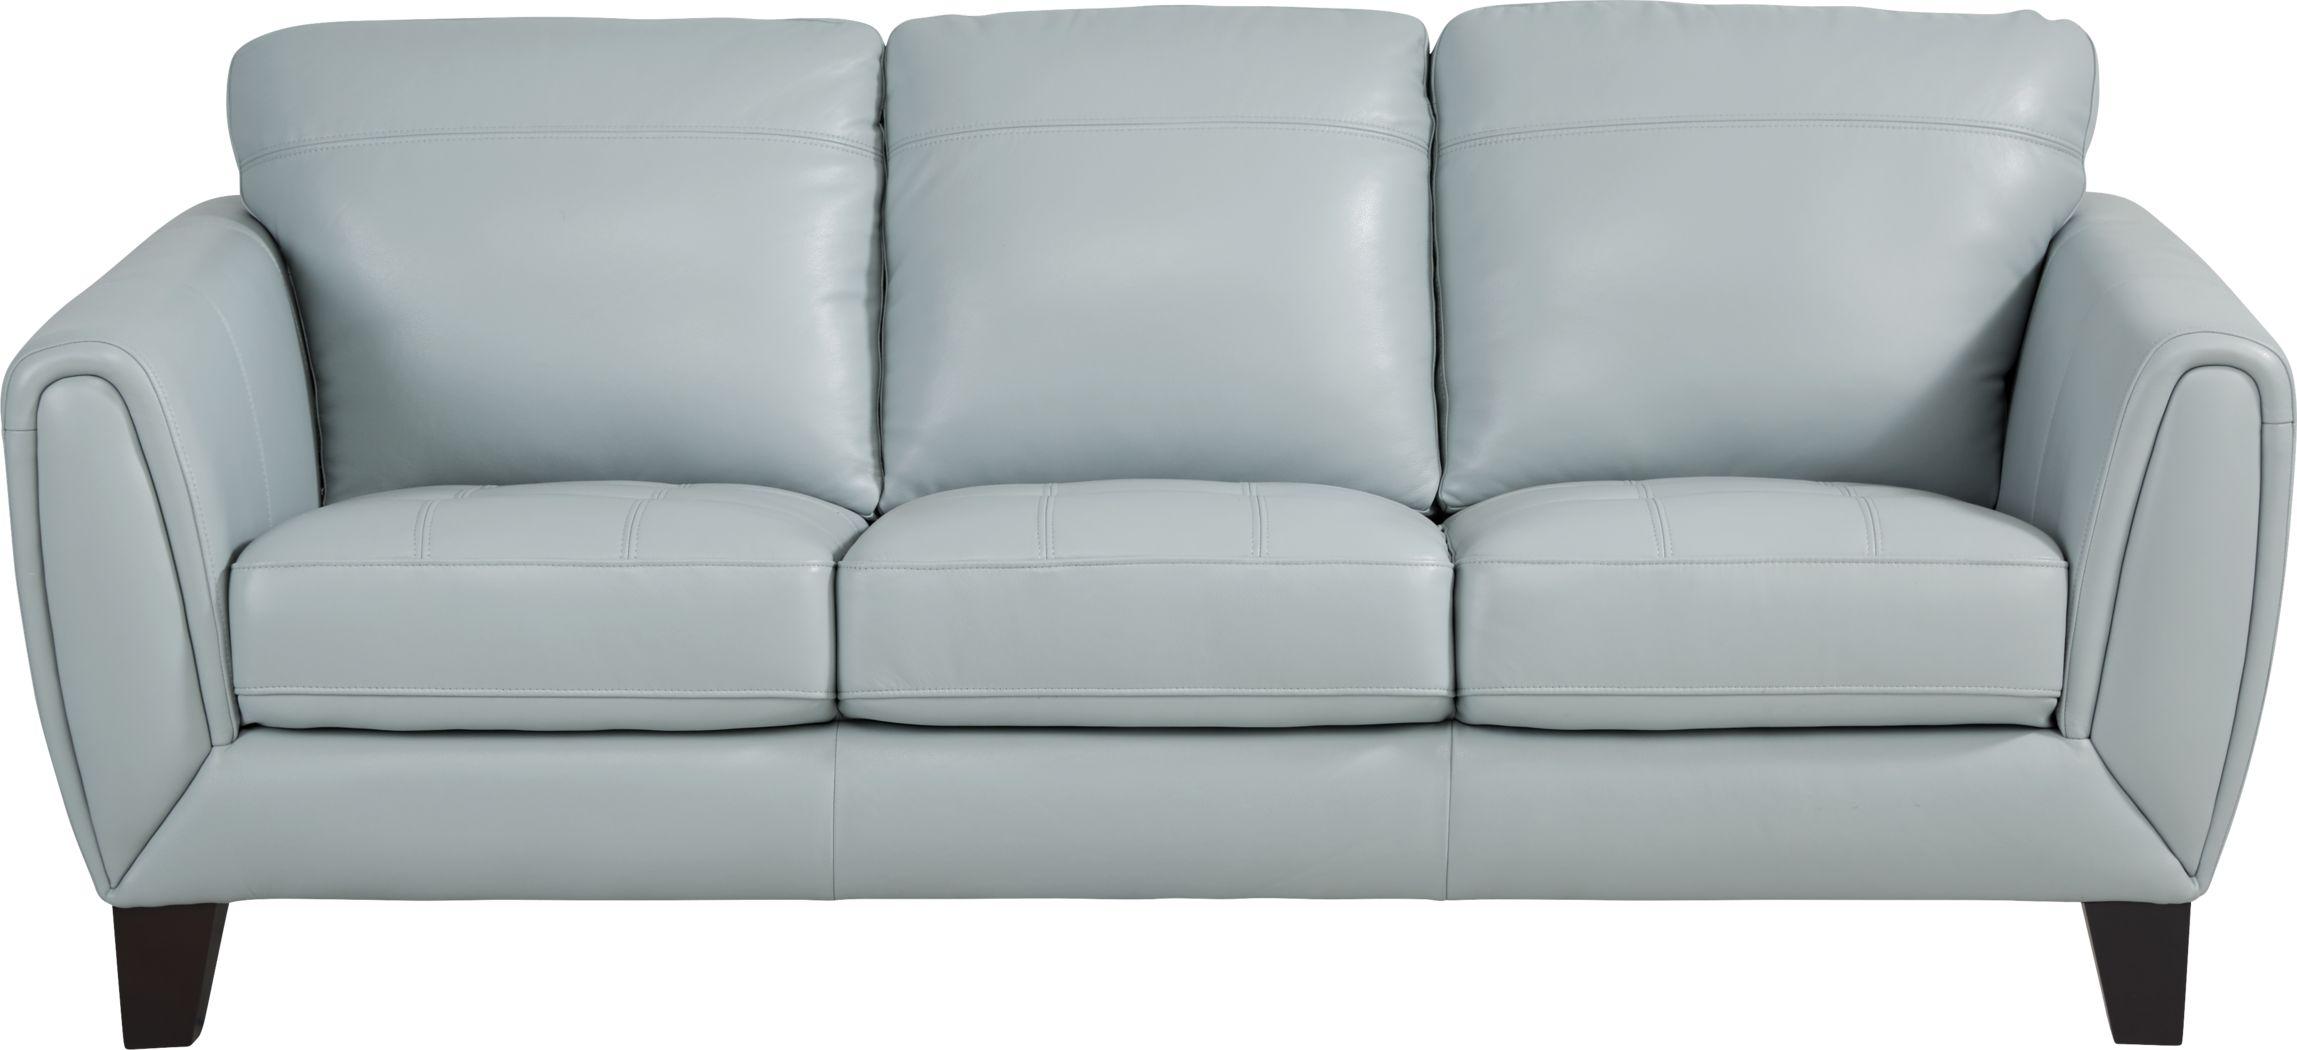 livorno lane aqua leather sofa